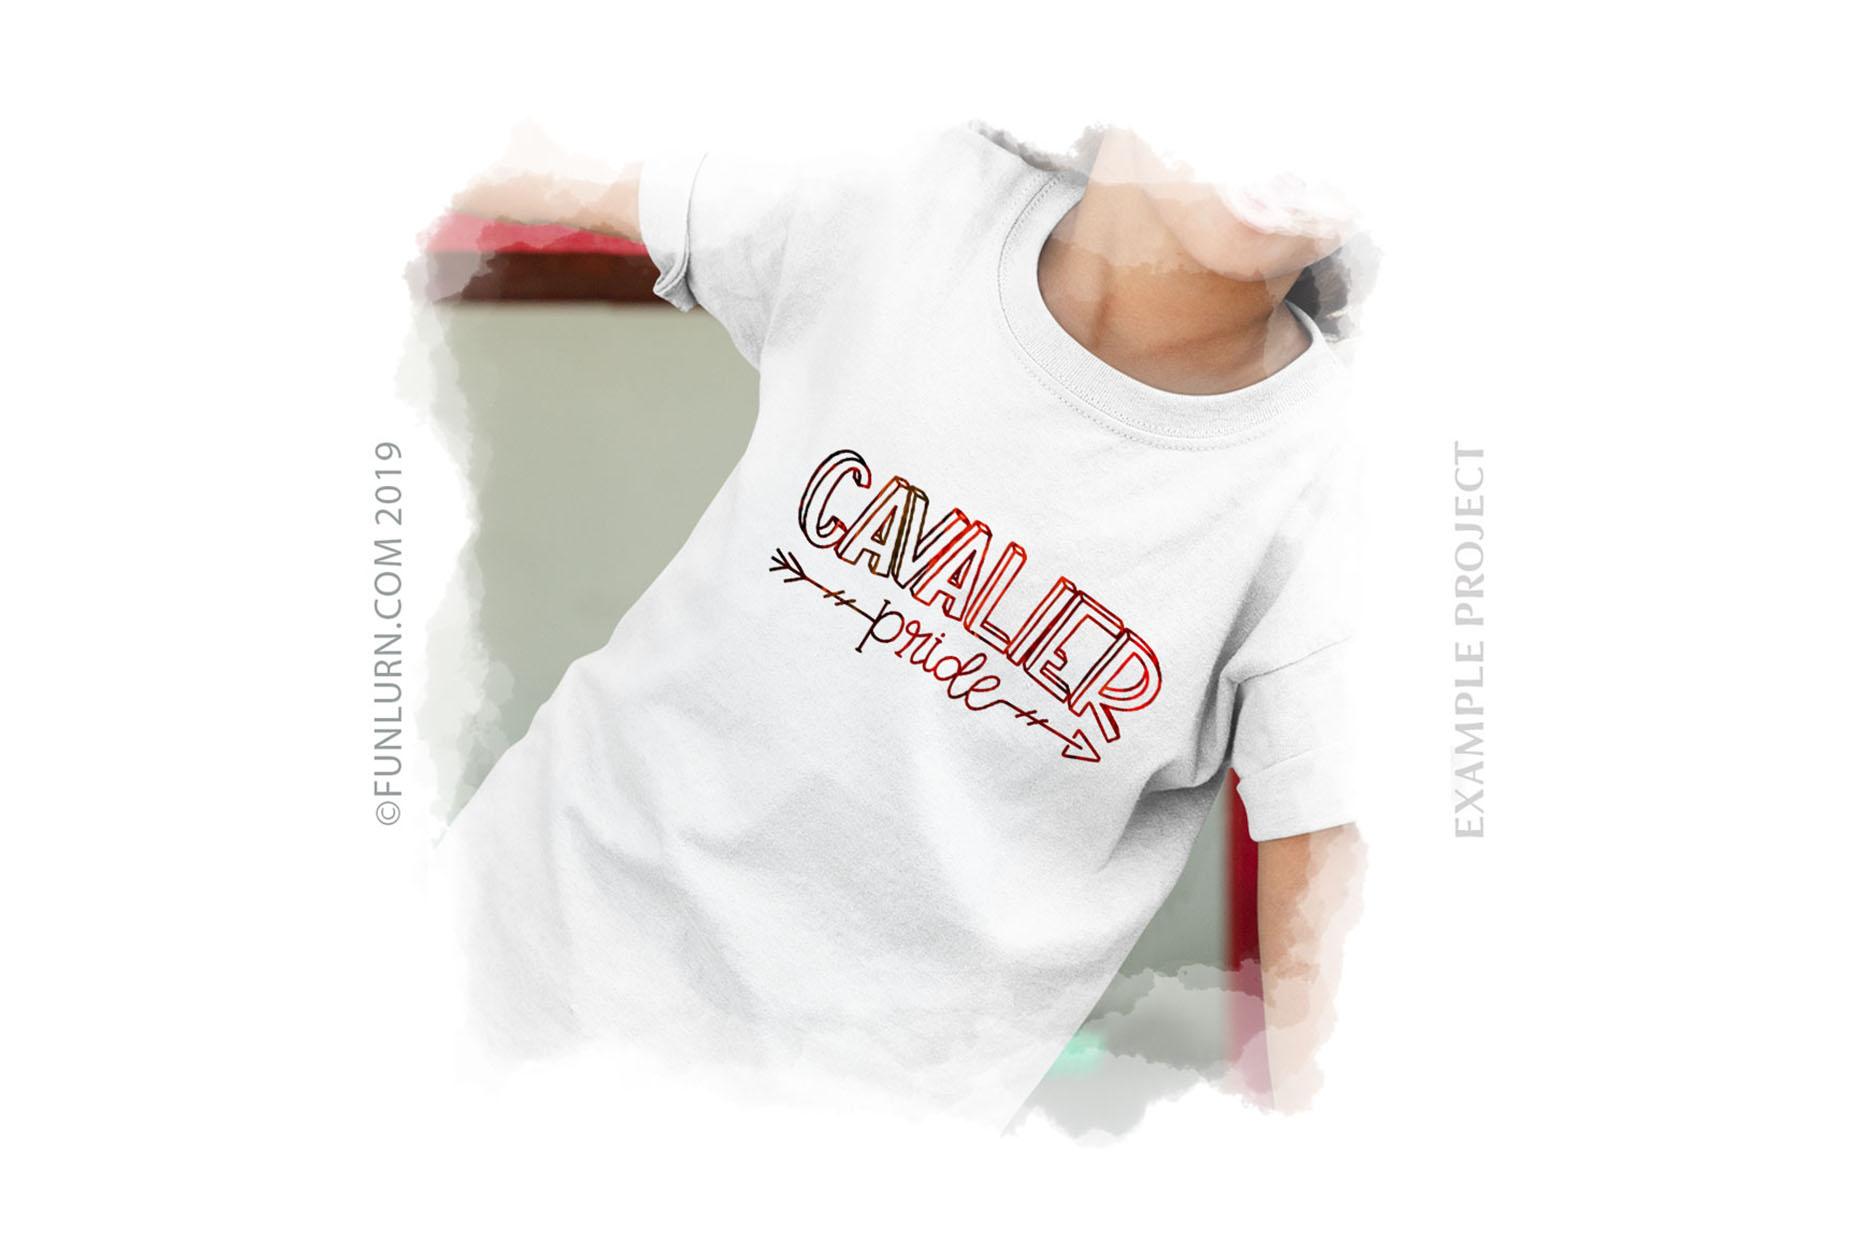 Cavalier Pride Team SVG Cut File example image 3